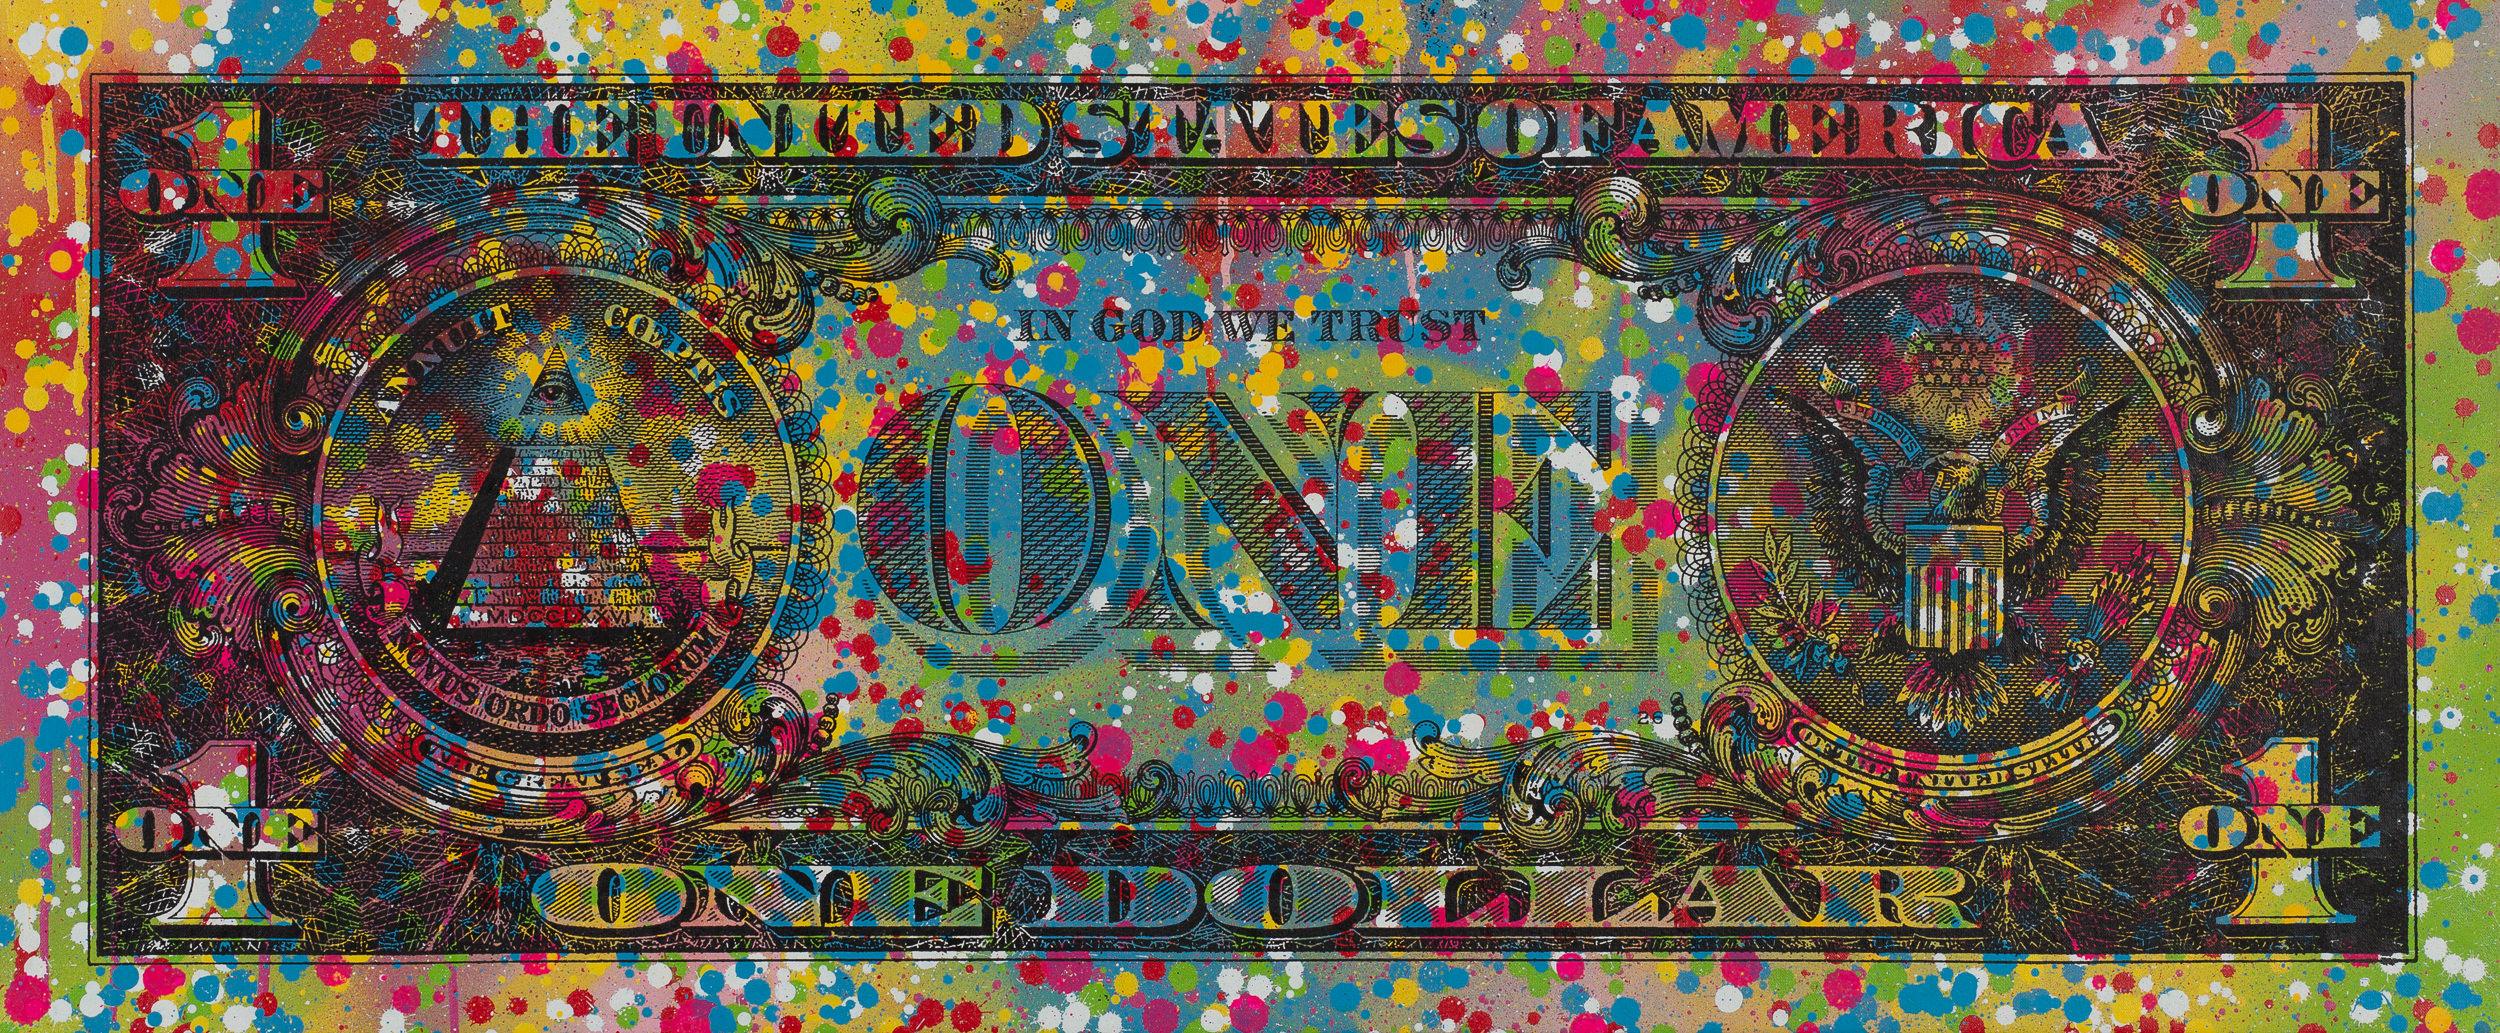 Psychedelic-Dollar_Spray_paint_screenprint_on_canvas_50cm_x_120cm_x_4.5cm.jpg